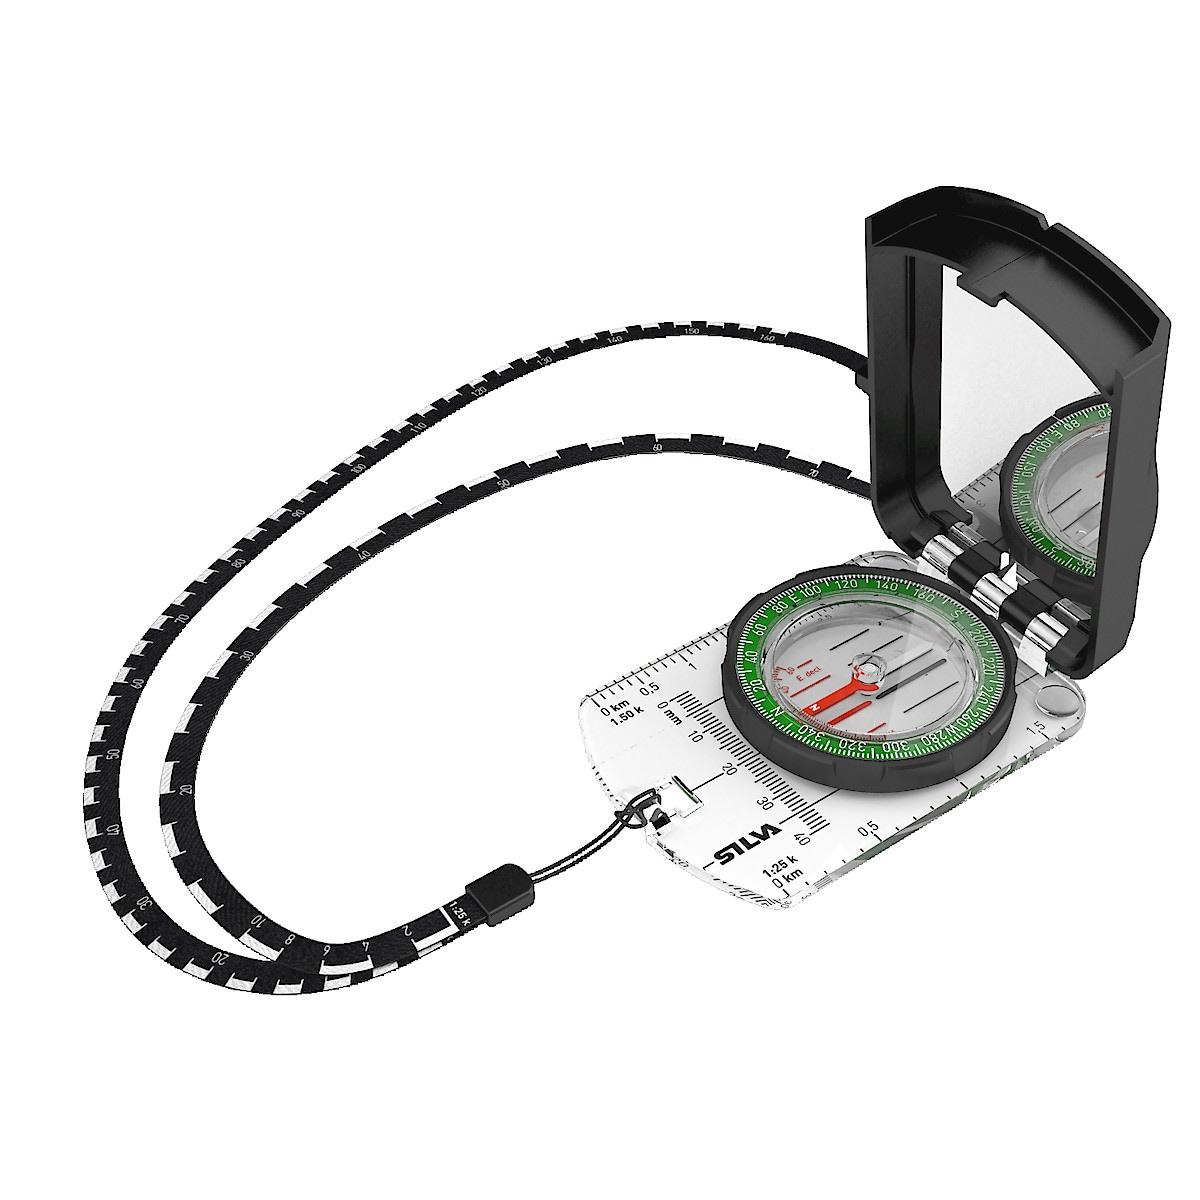 Silva Ranger S speilkompass